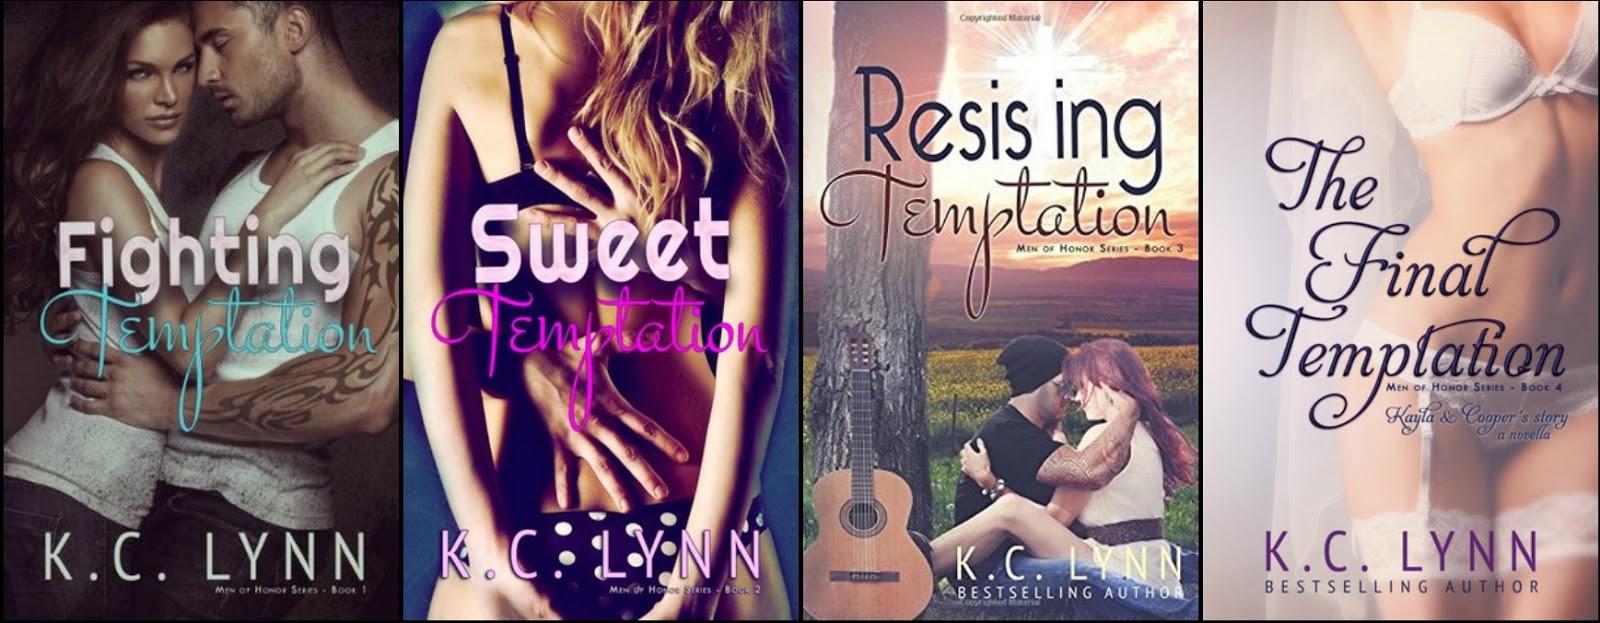 Kc lynn goodreads giveaways